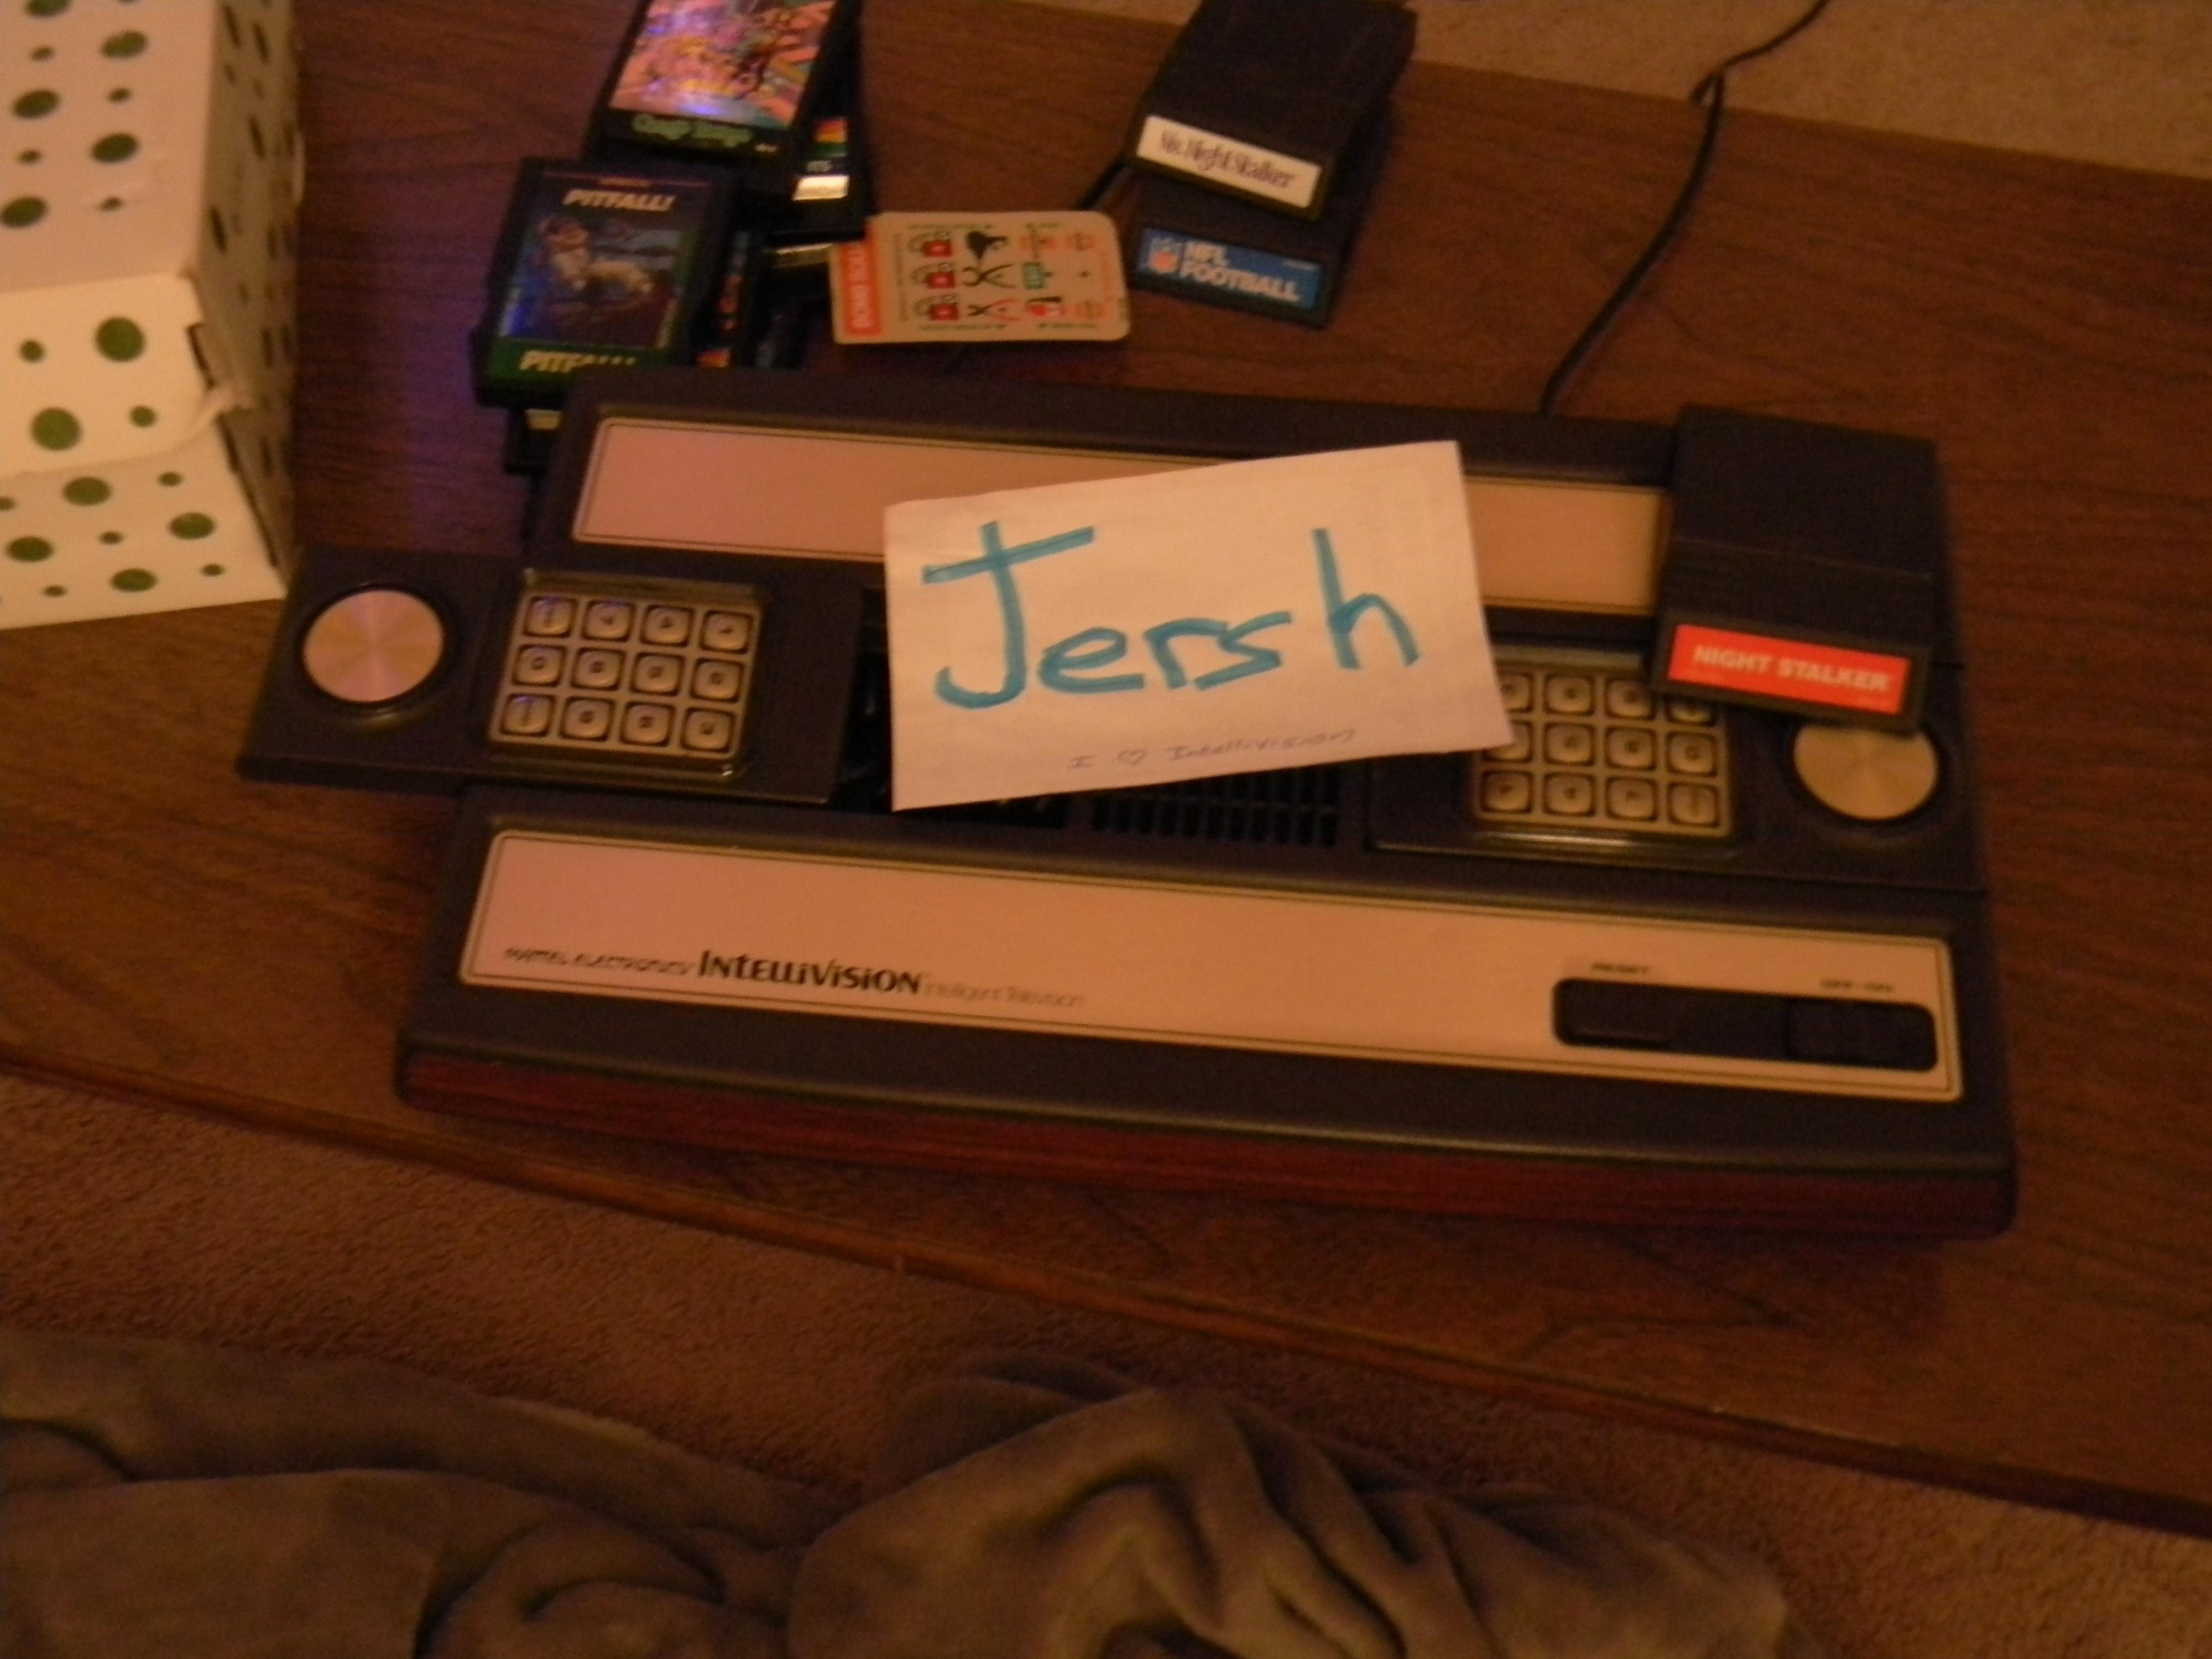 jersh: Night Stalker: Game Disc [Fastest] (Intellivision) 624,700 points on 2018-02-04 13:47:23